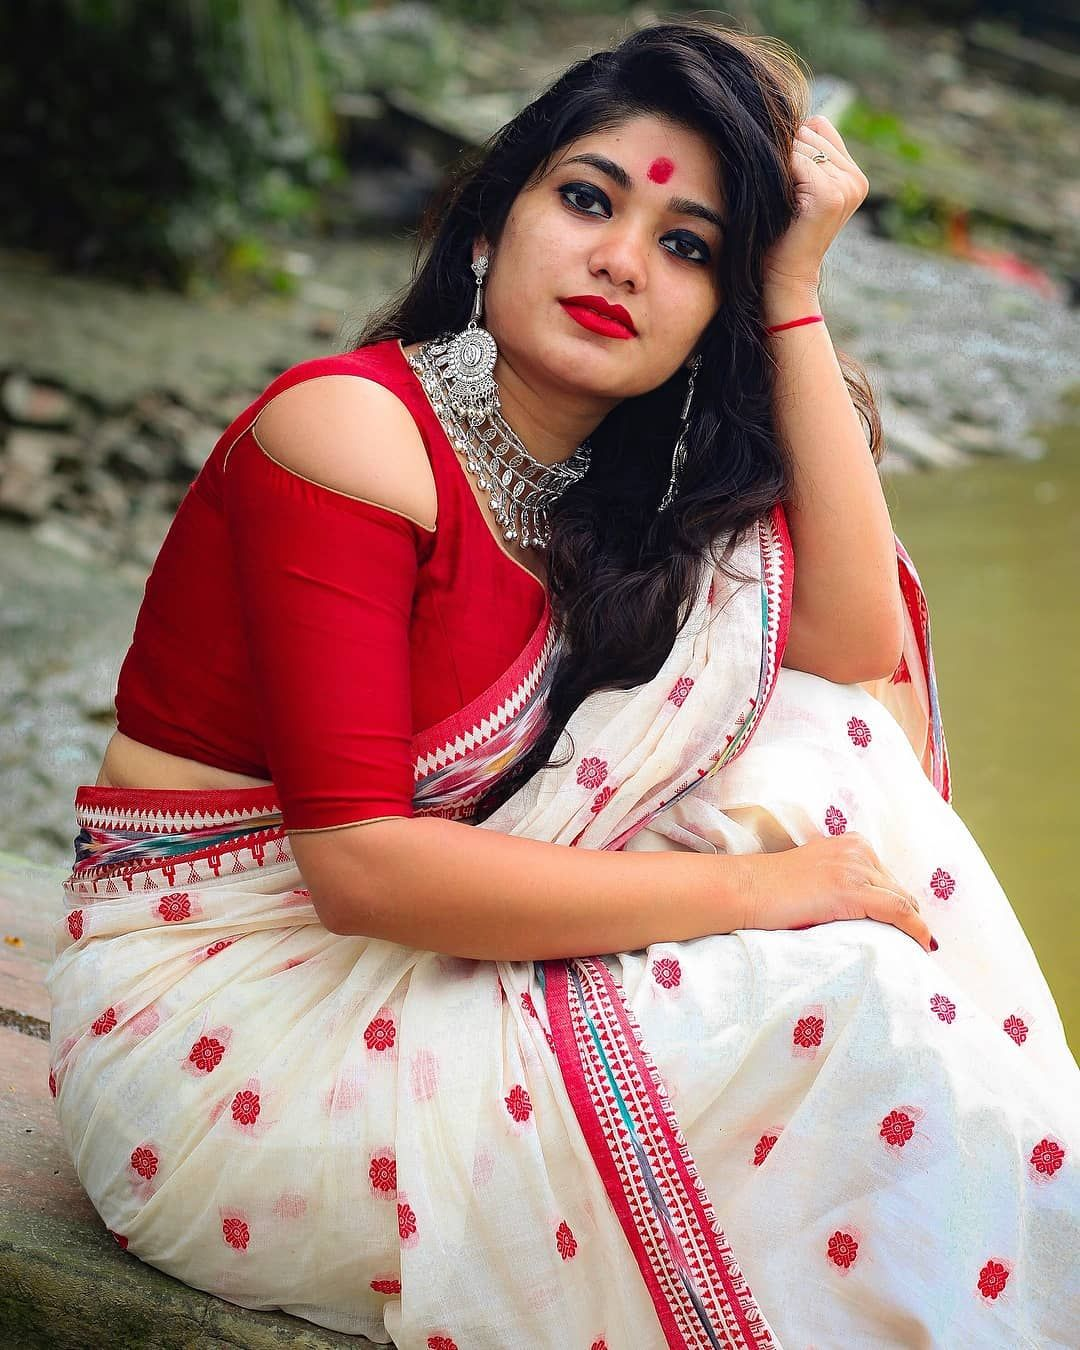 Pin by MJ LOVE on Beautiful saree Indian girls